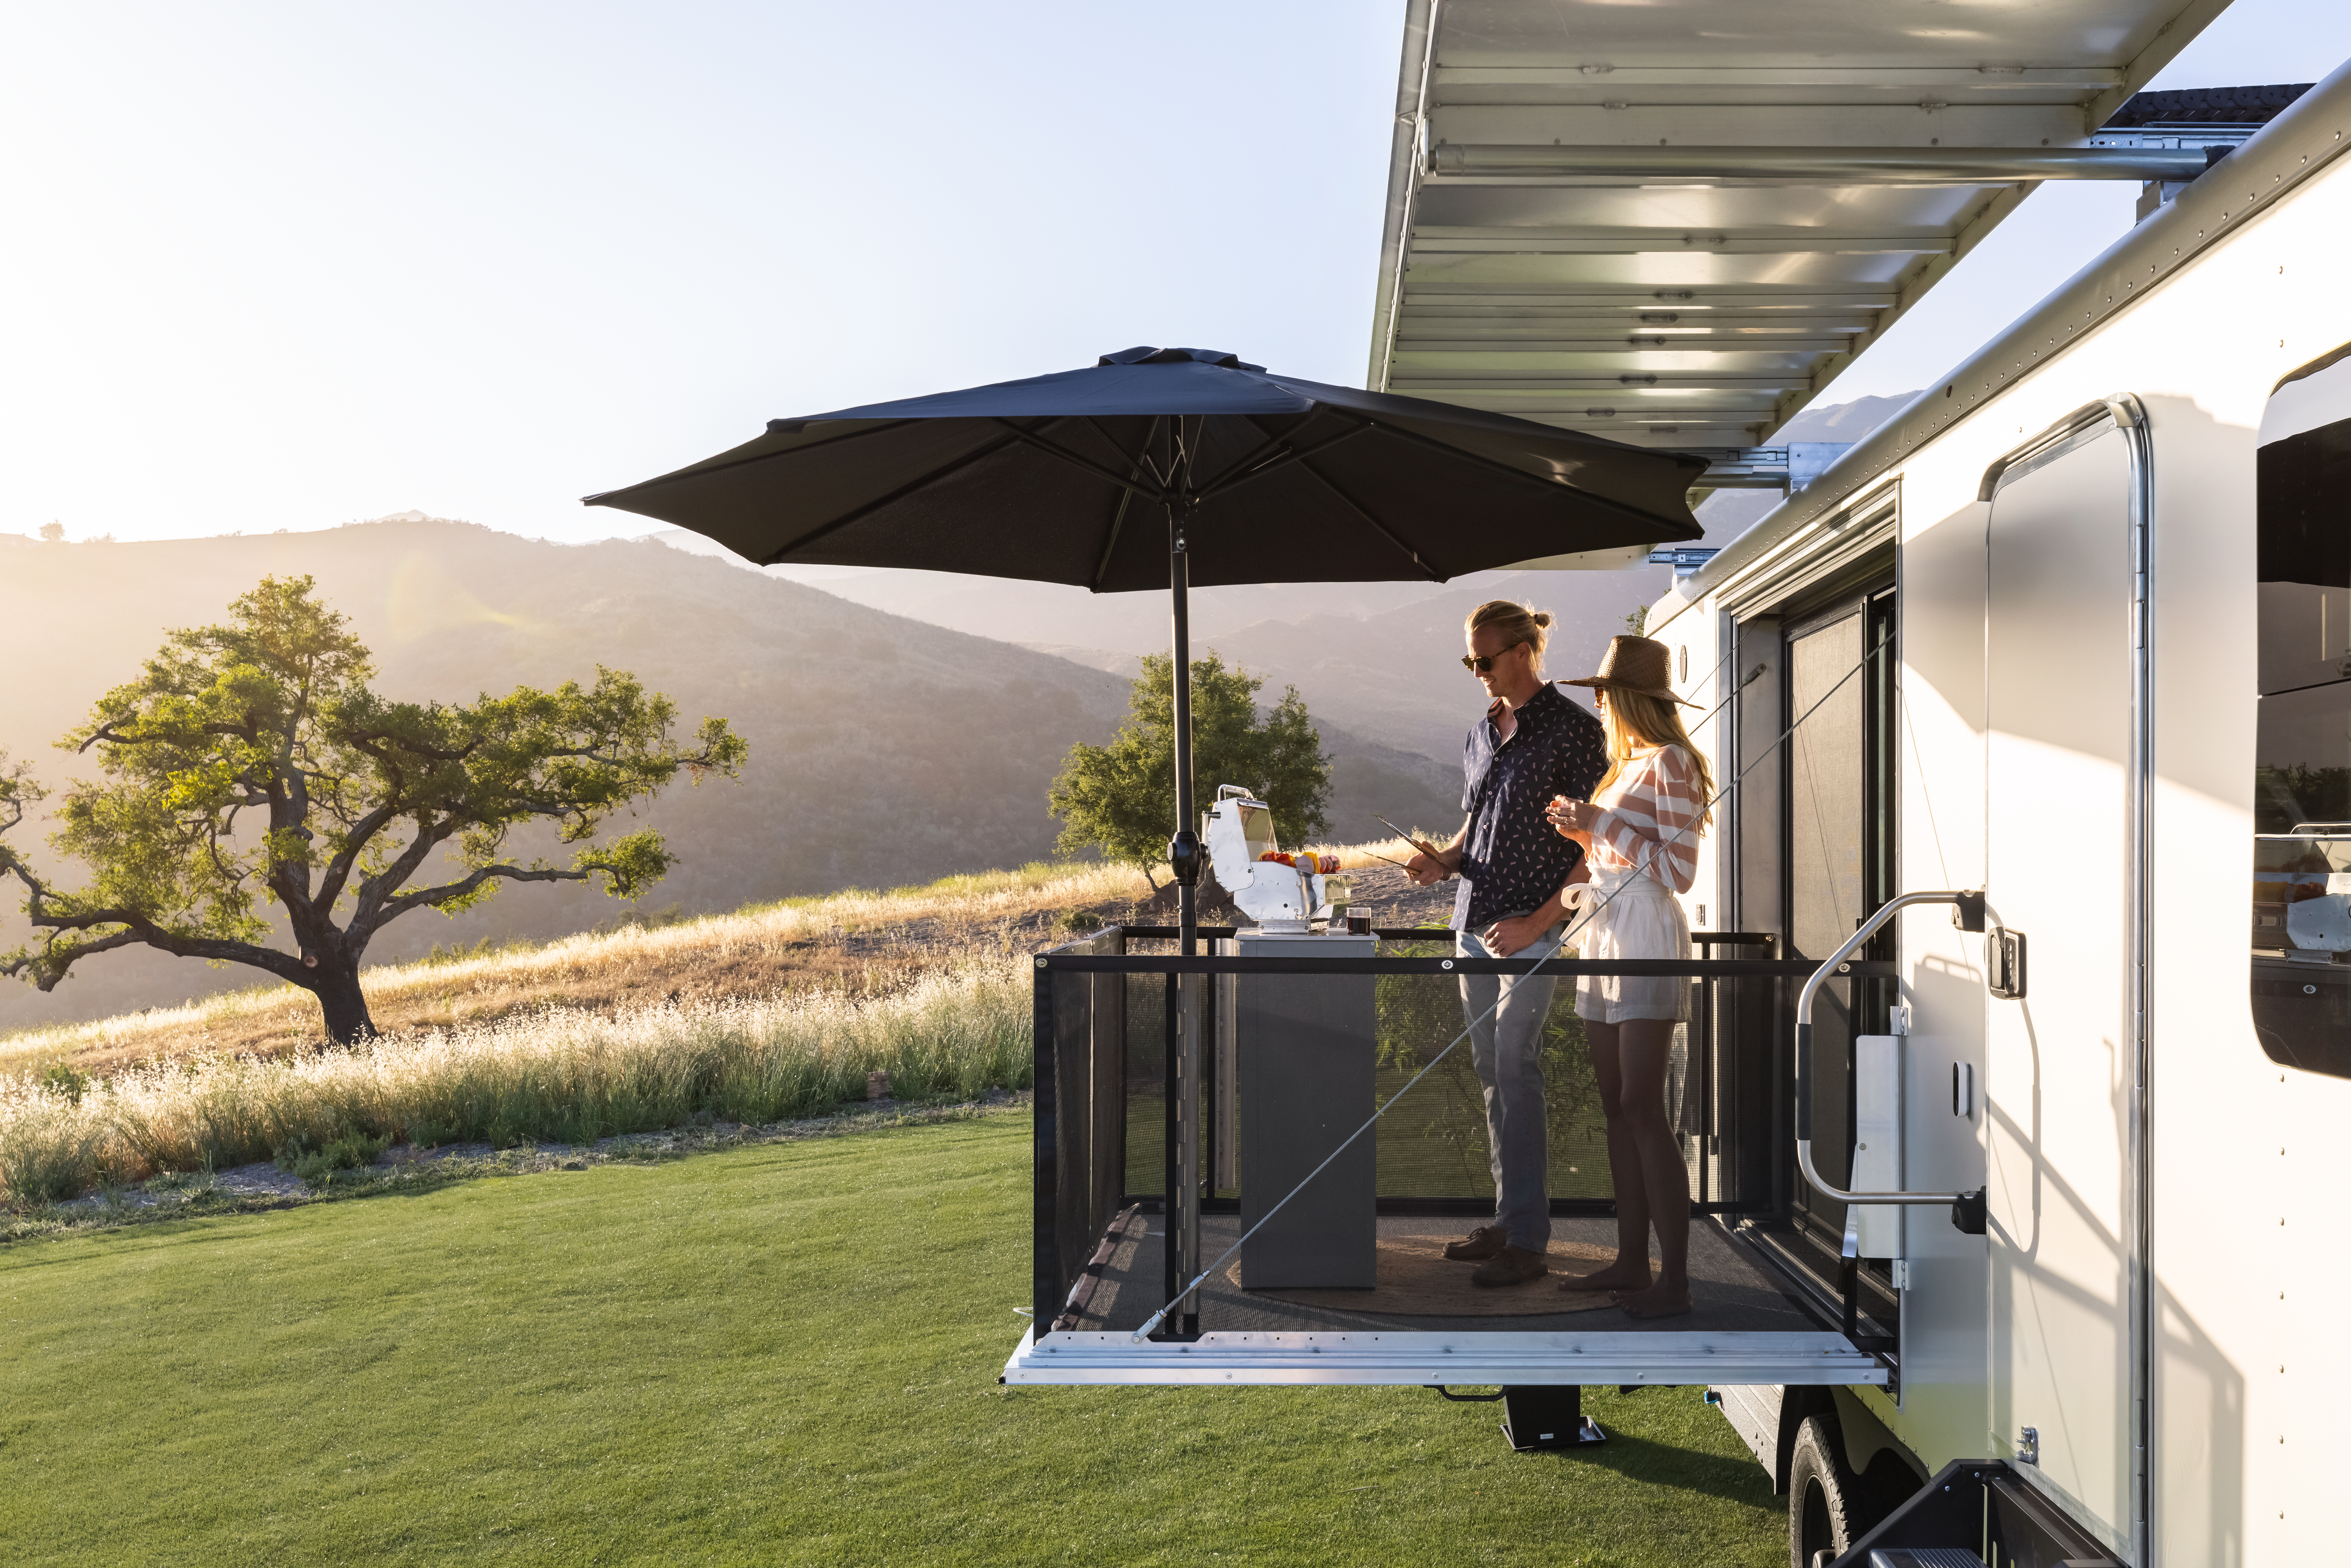 living vehicle trailer deck